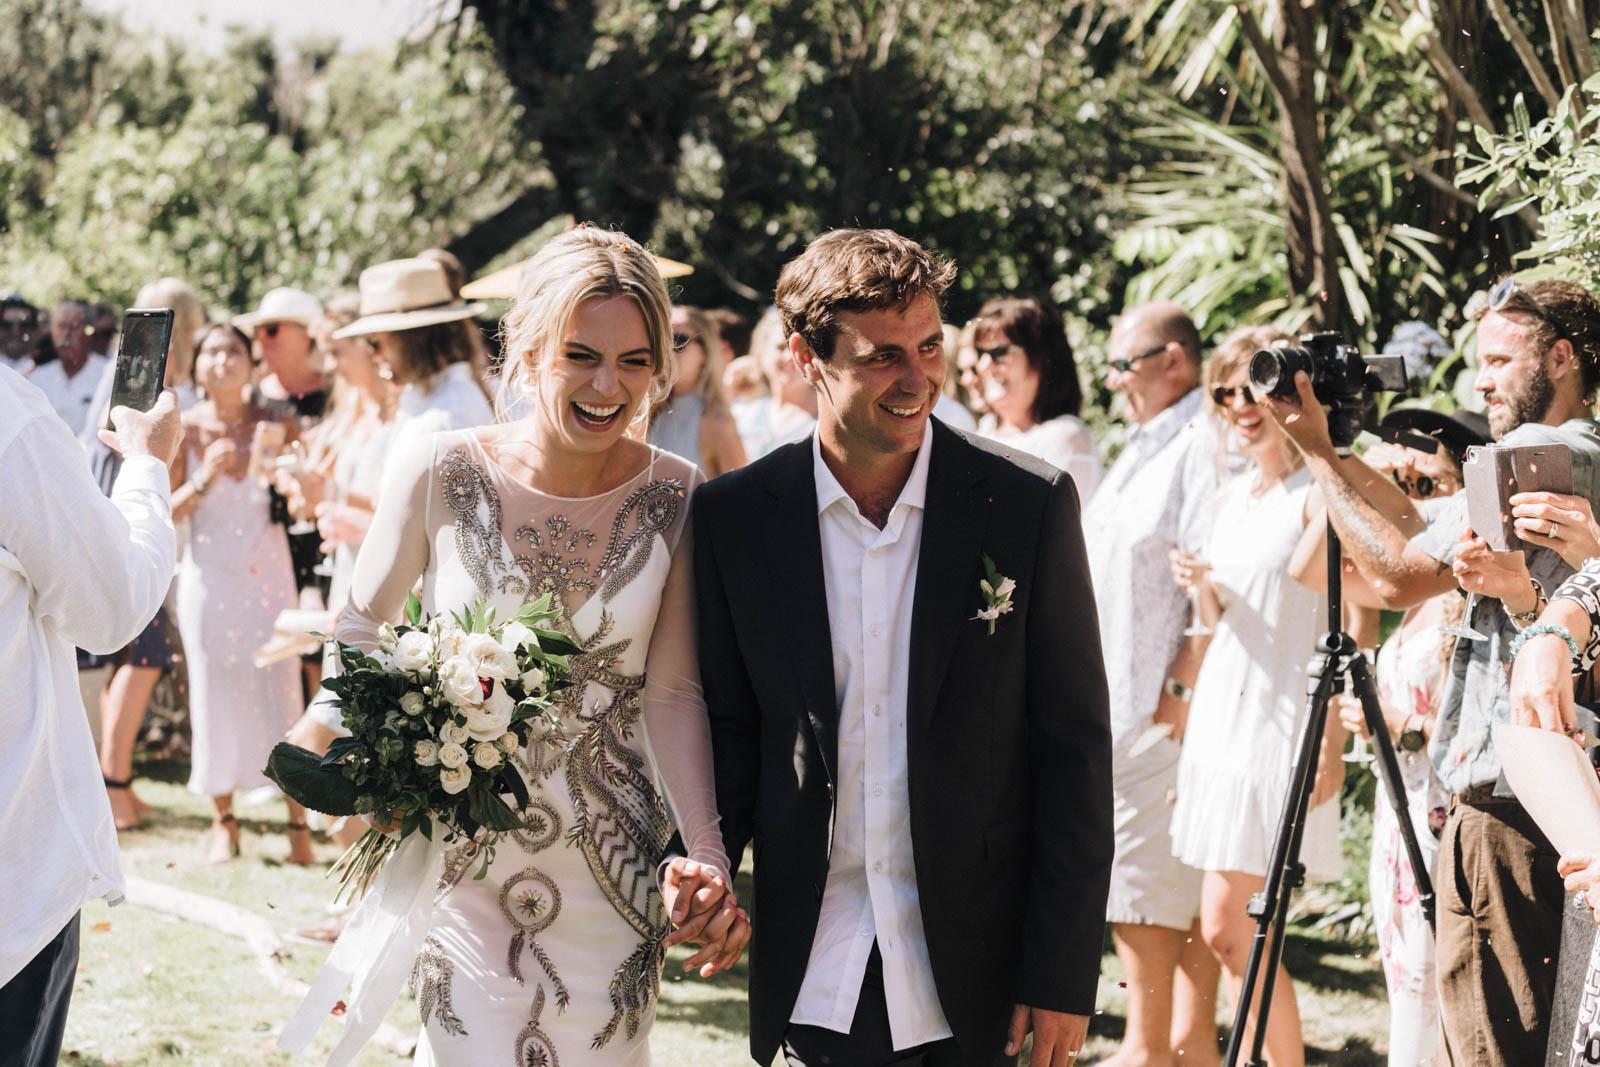 newfound-l-i-coromandel-wedding-photographer-1617-A9_03155